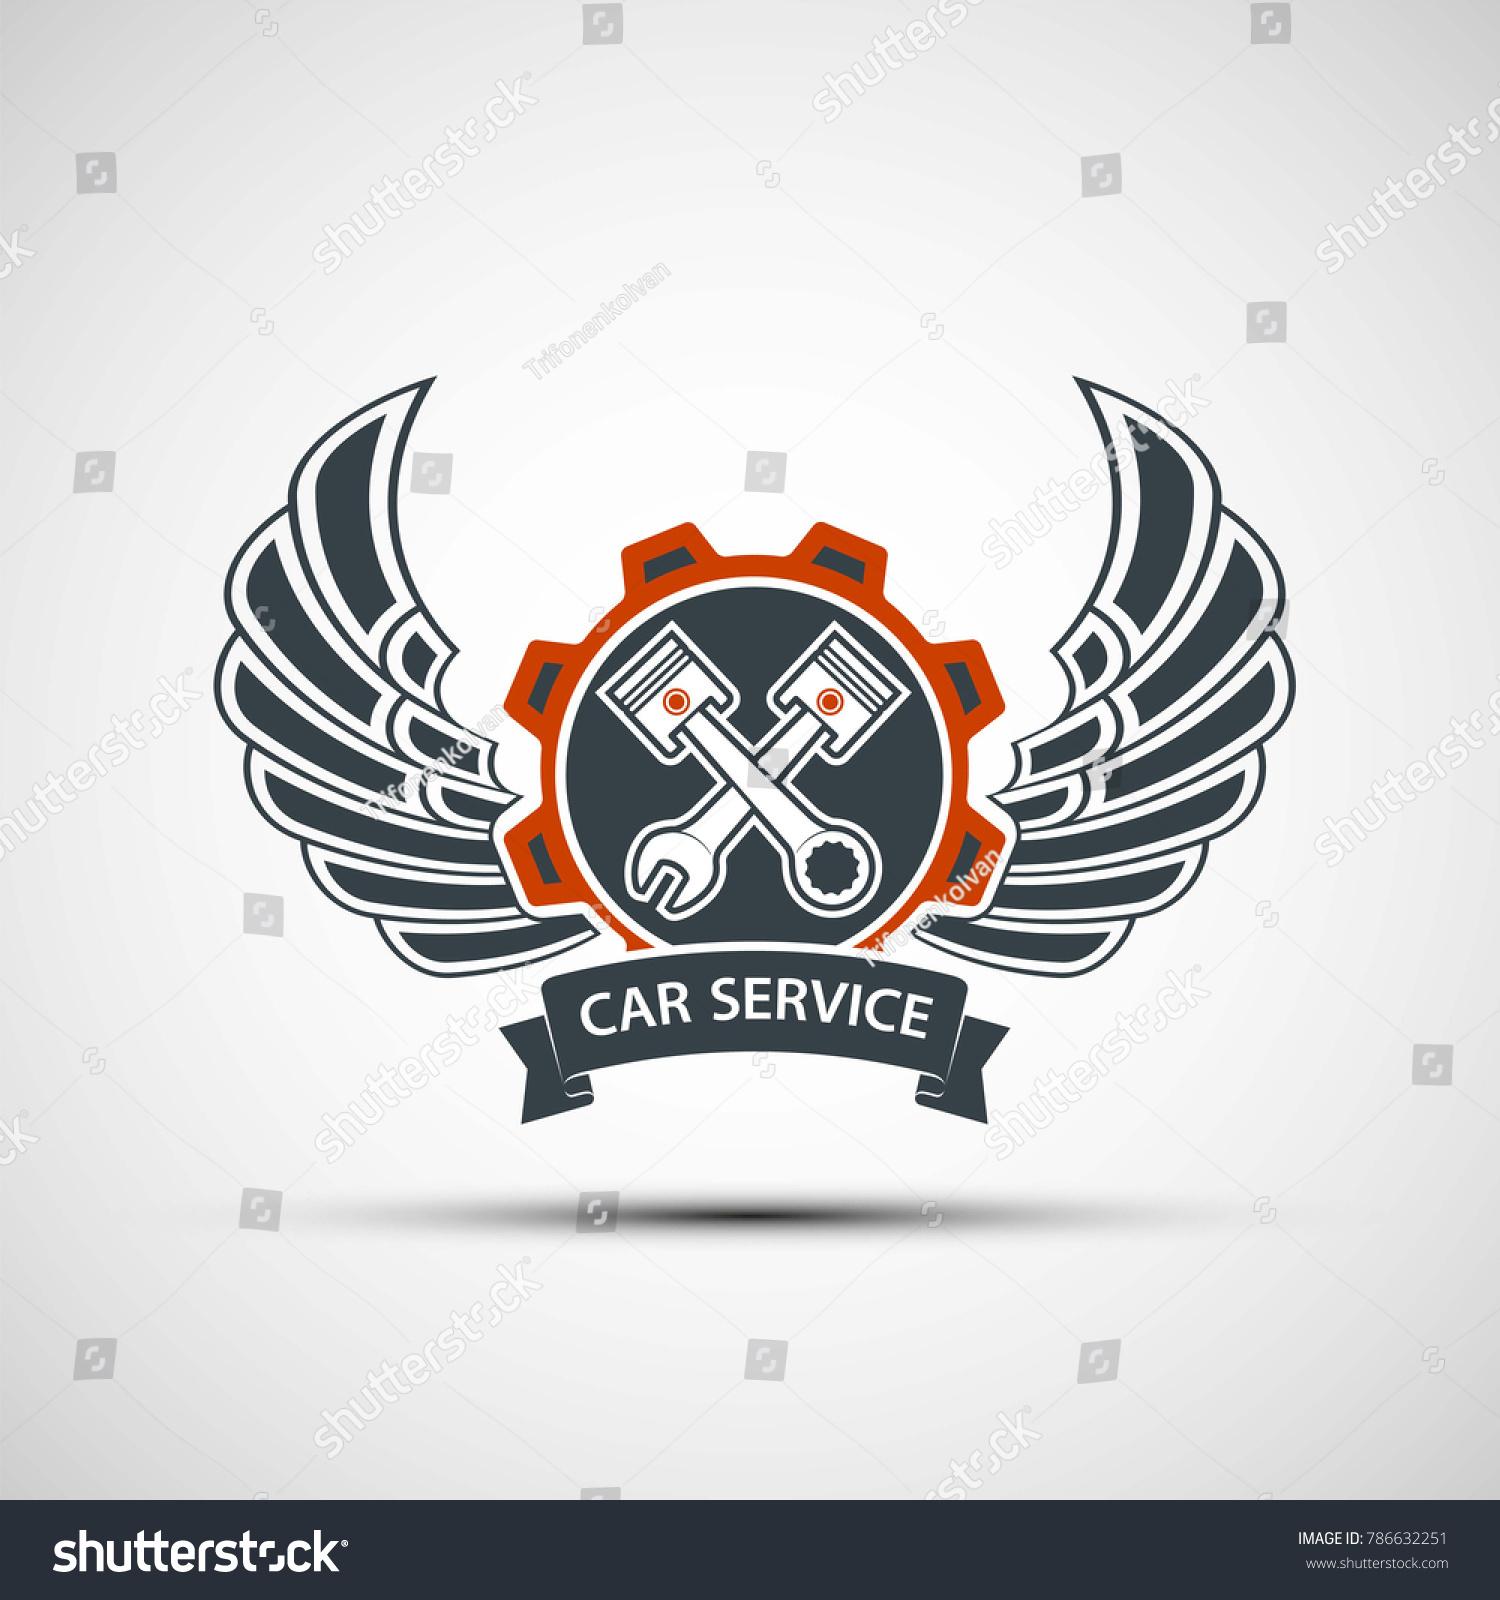 locksmith logos templates. Logo Engine Plungers Wings Tool Wrench Stock Illustration 786632251 - Shutterstock Locksmith Logos Templates E